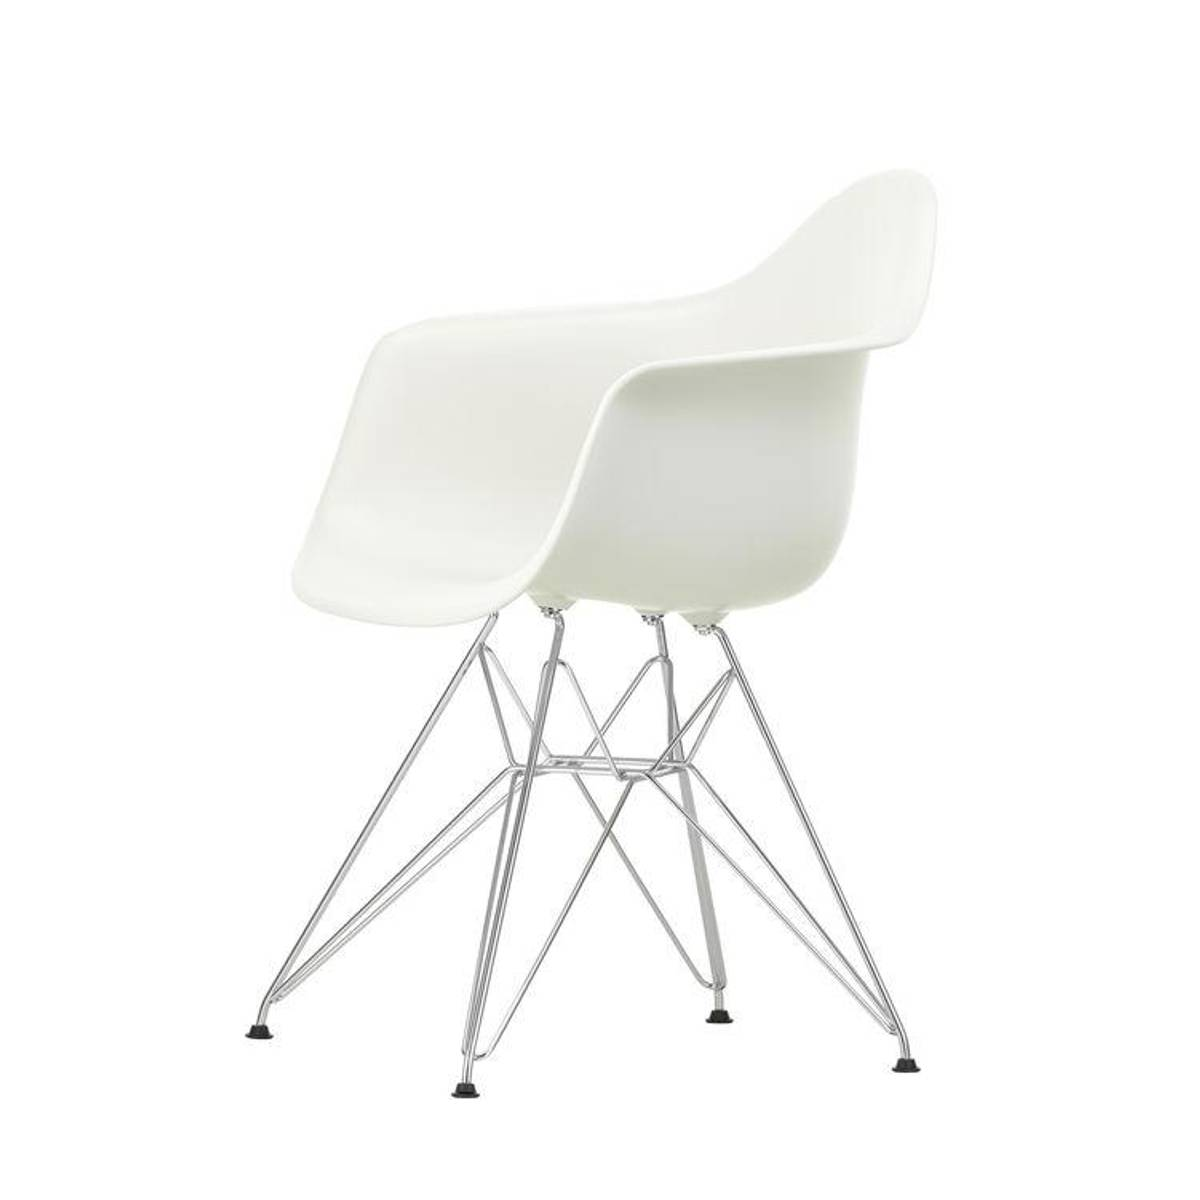 Eames Plastic Armchair DAR 04 White m/chrome 01 base Vitra